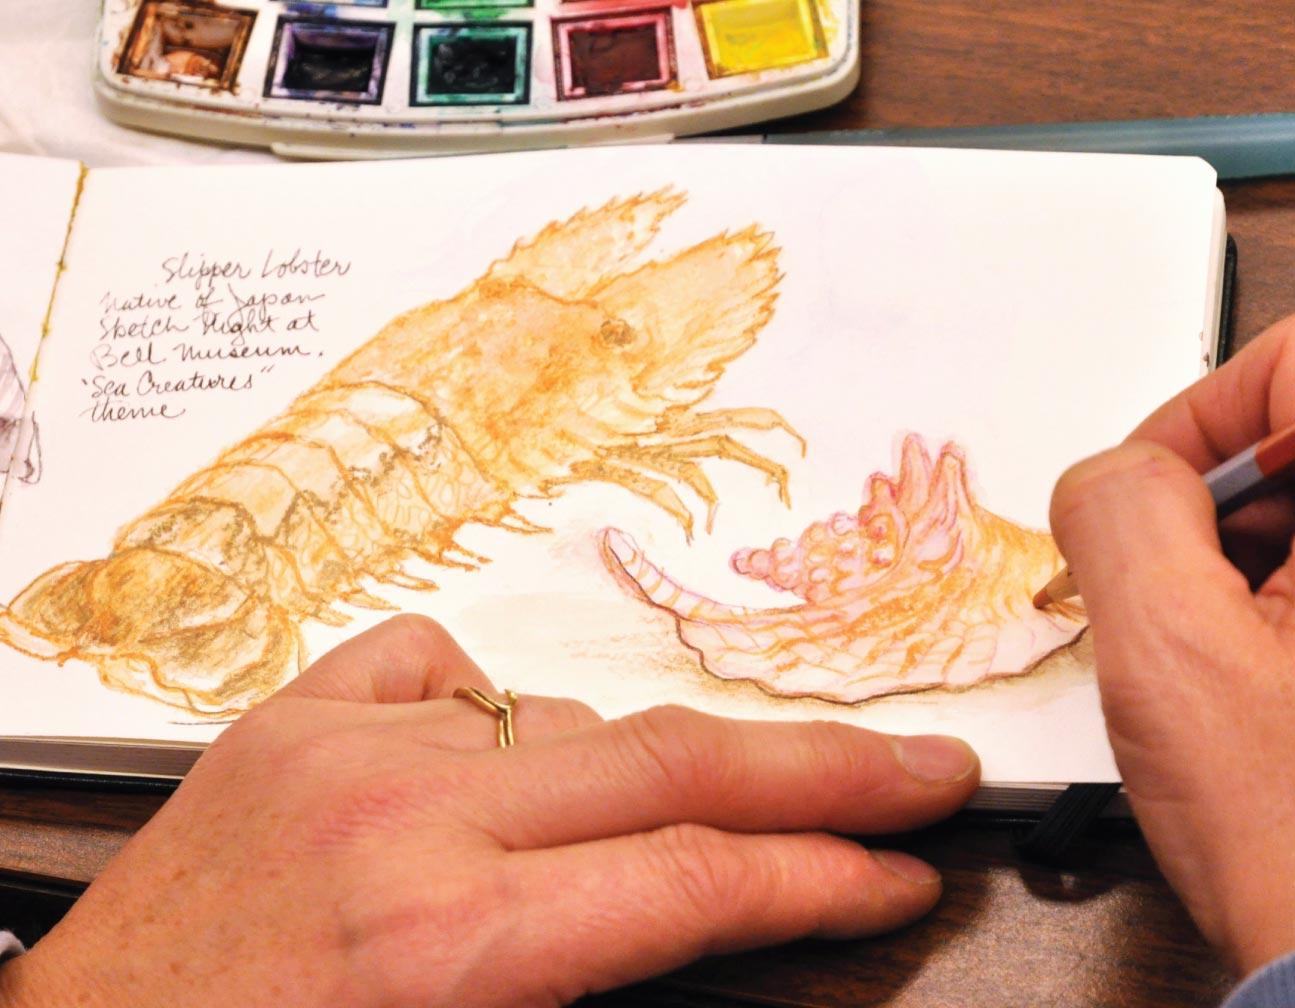 Sketch of a slipper lobster